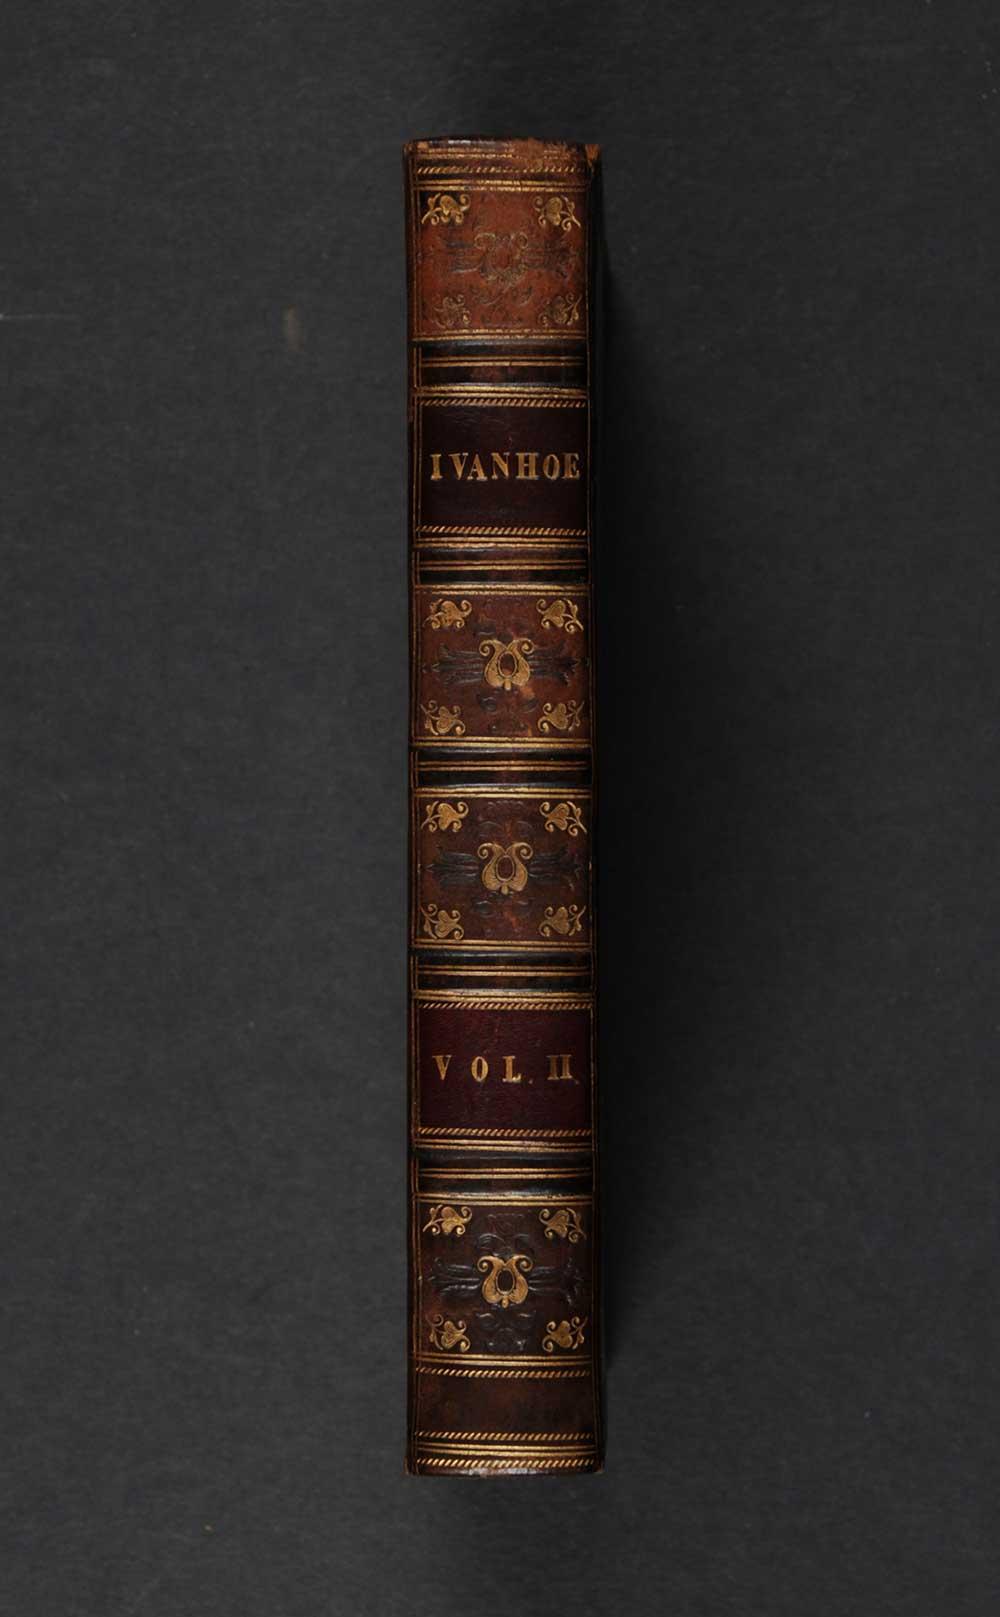 [Sir Walter Scott]. <em>Ivanhoe: a romance.</em> [1st edition]. Edinburgh: Printed for Archibald Constable and Co., Edinburgh; and Hurst, Robinson, and Co., London, 1820. Three volumes; Vol. 2 displayed.